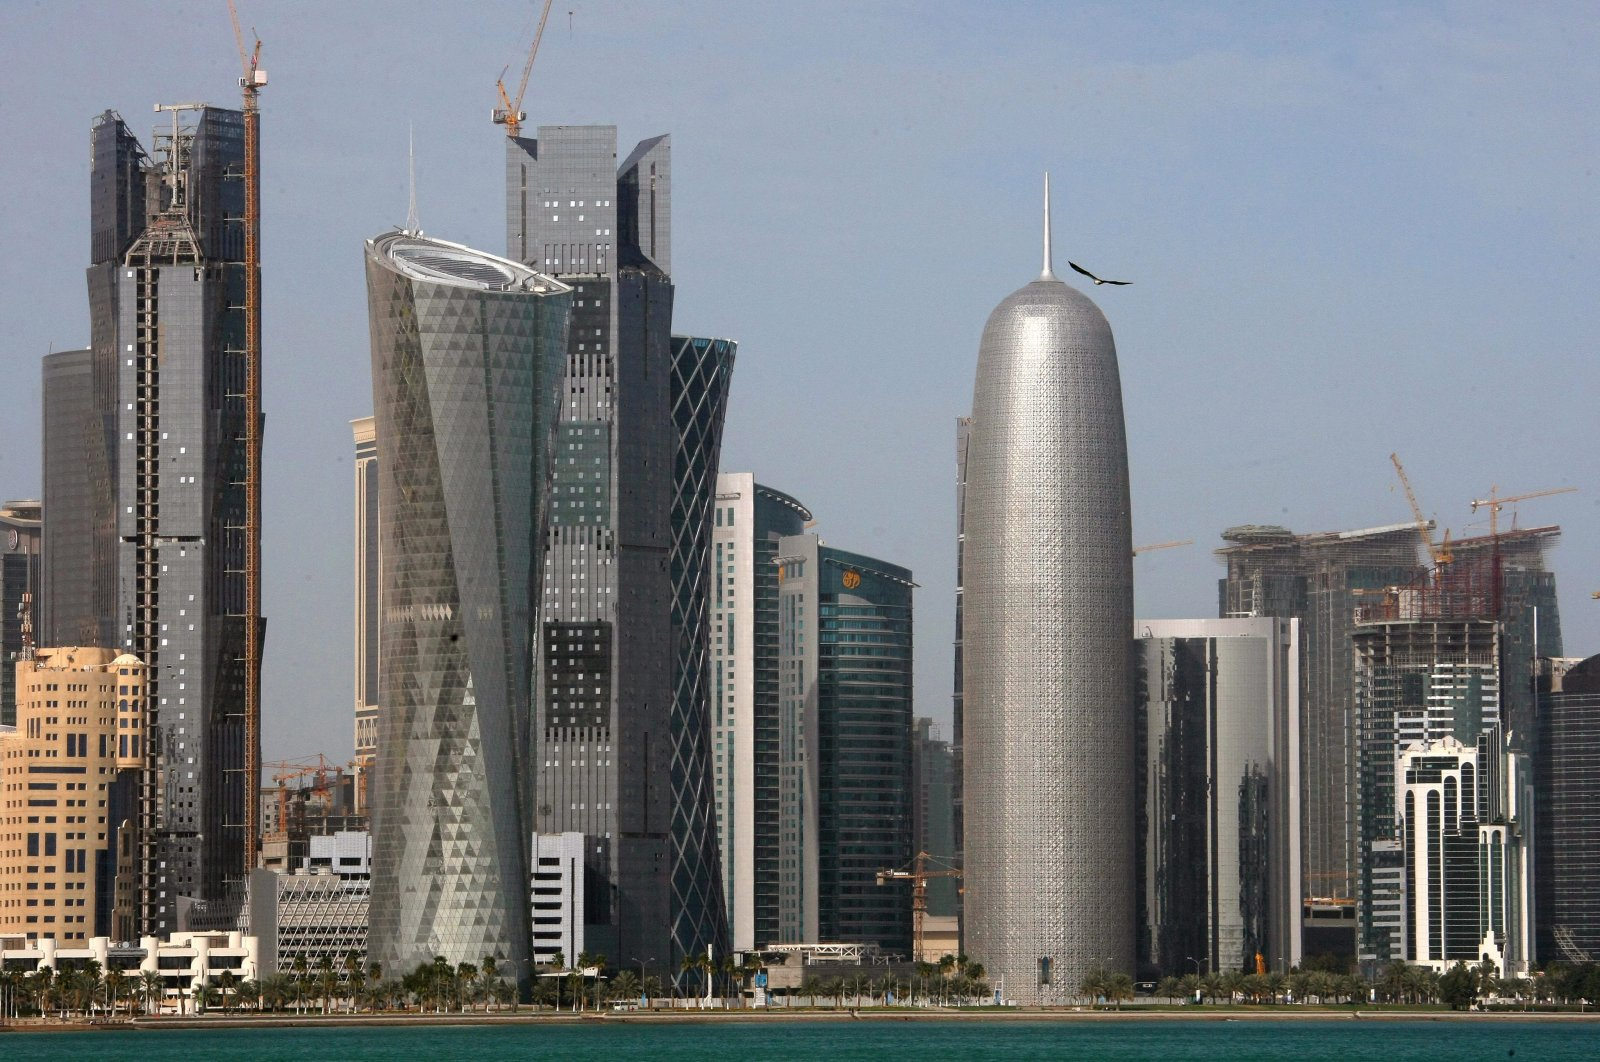 A file photo of the skyline of Doha, Qatar, dated Feb. 5, 2010. (EPA Photo)